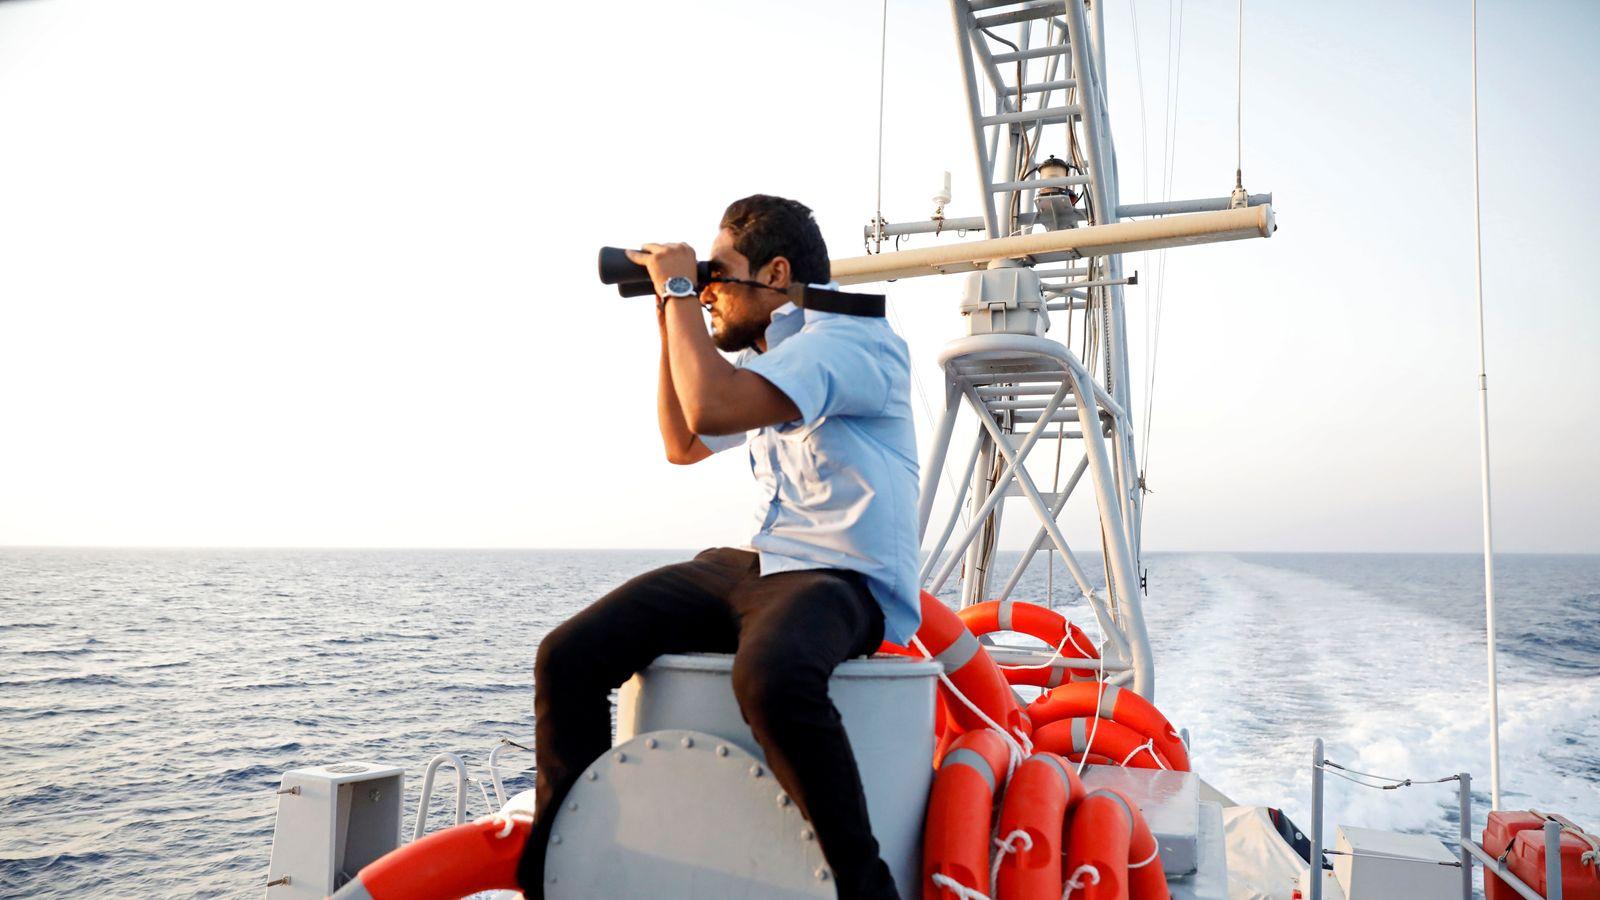 Libya intercepts almost 200 Europe-bound migrants at sea